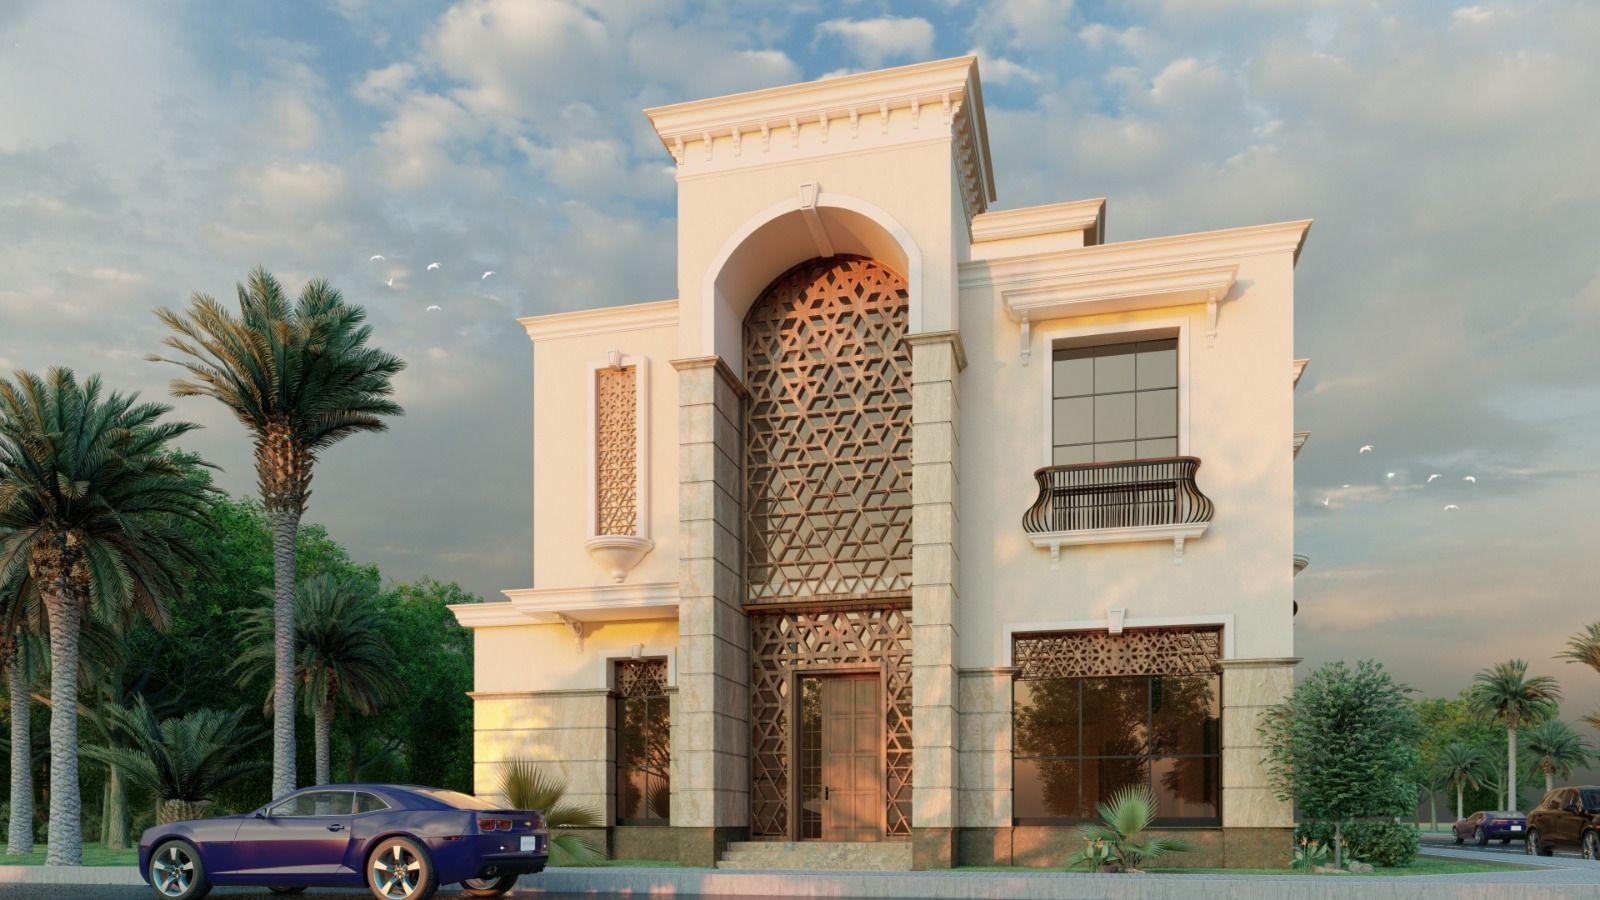 واجهة فيلا في جدة طراز اسلامي مودرن House Styles Mansions House